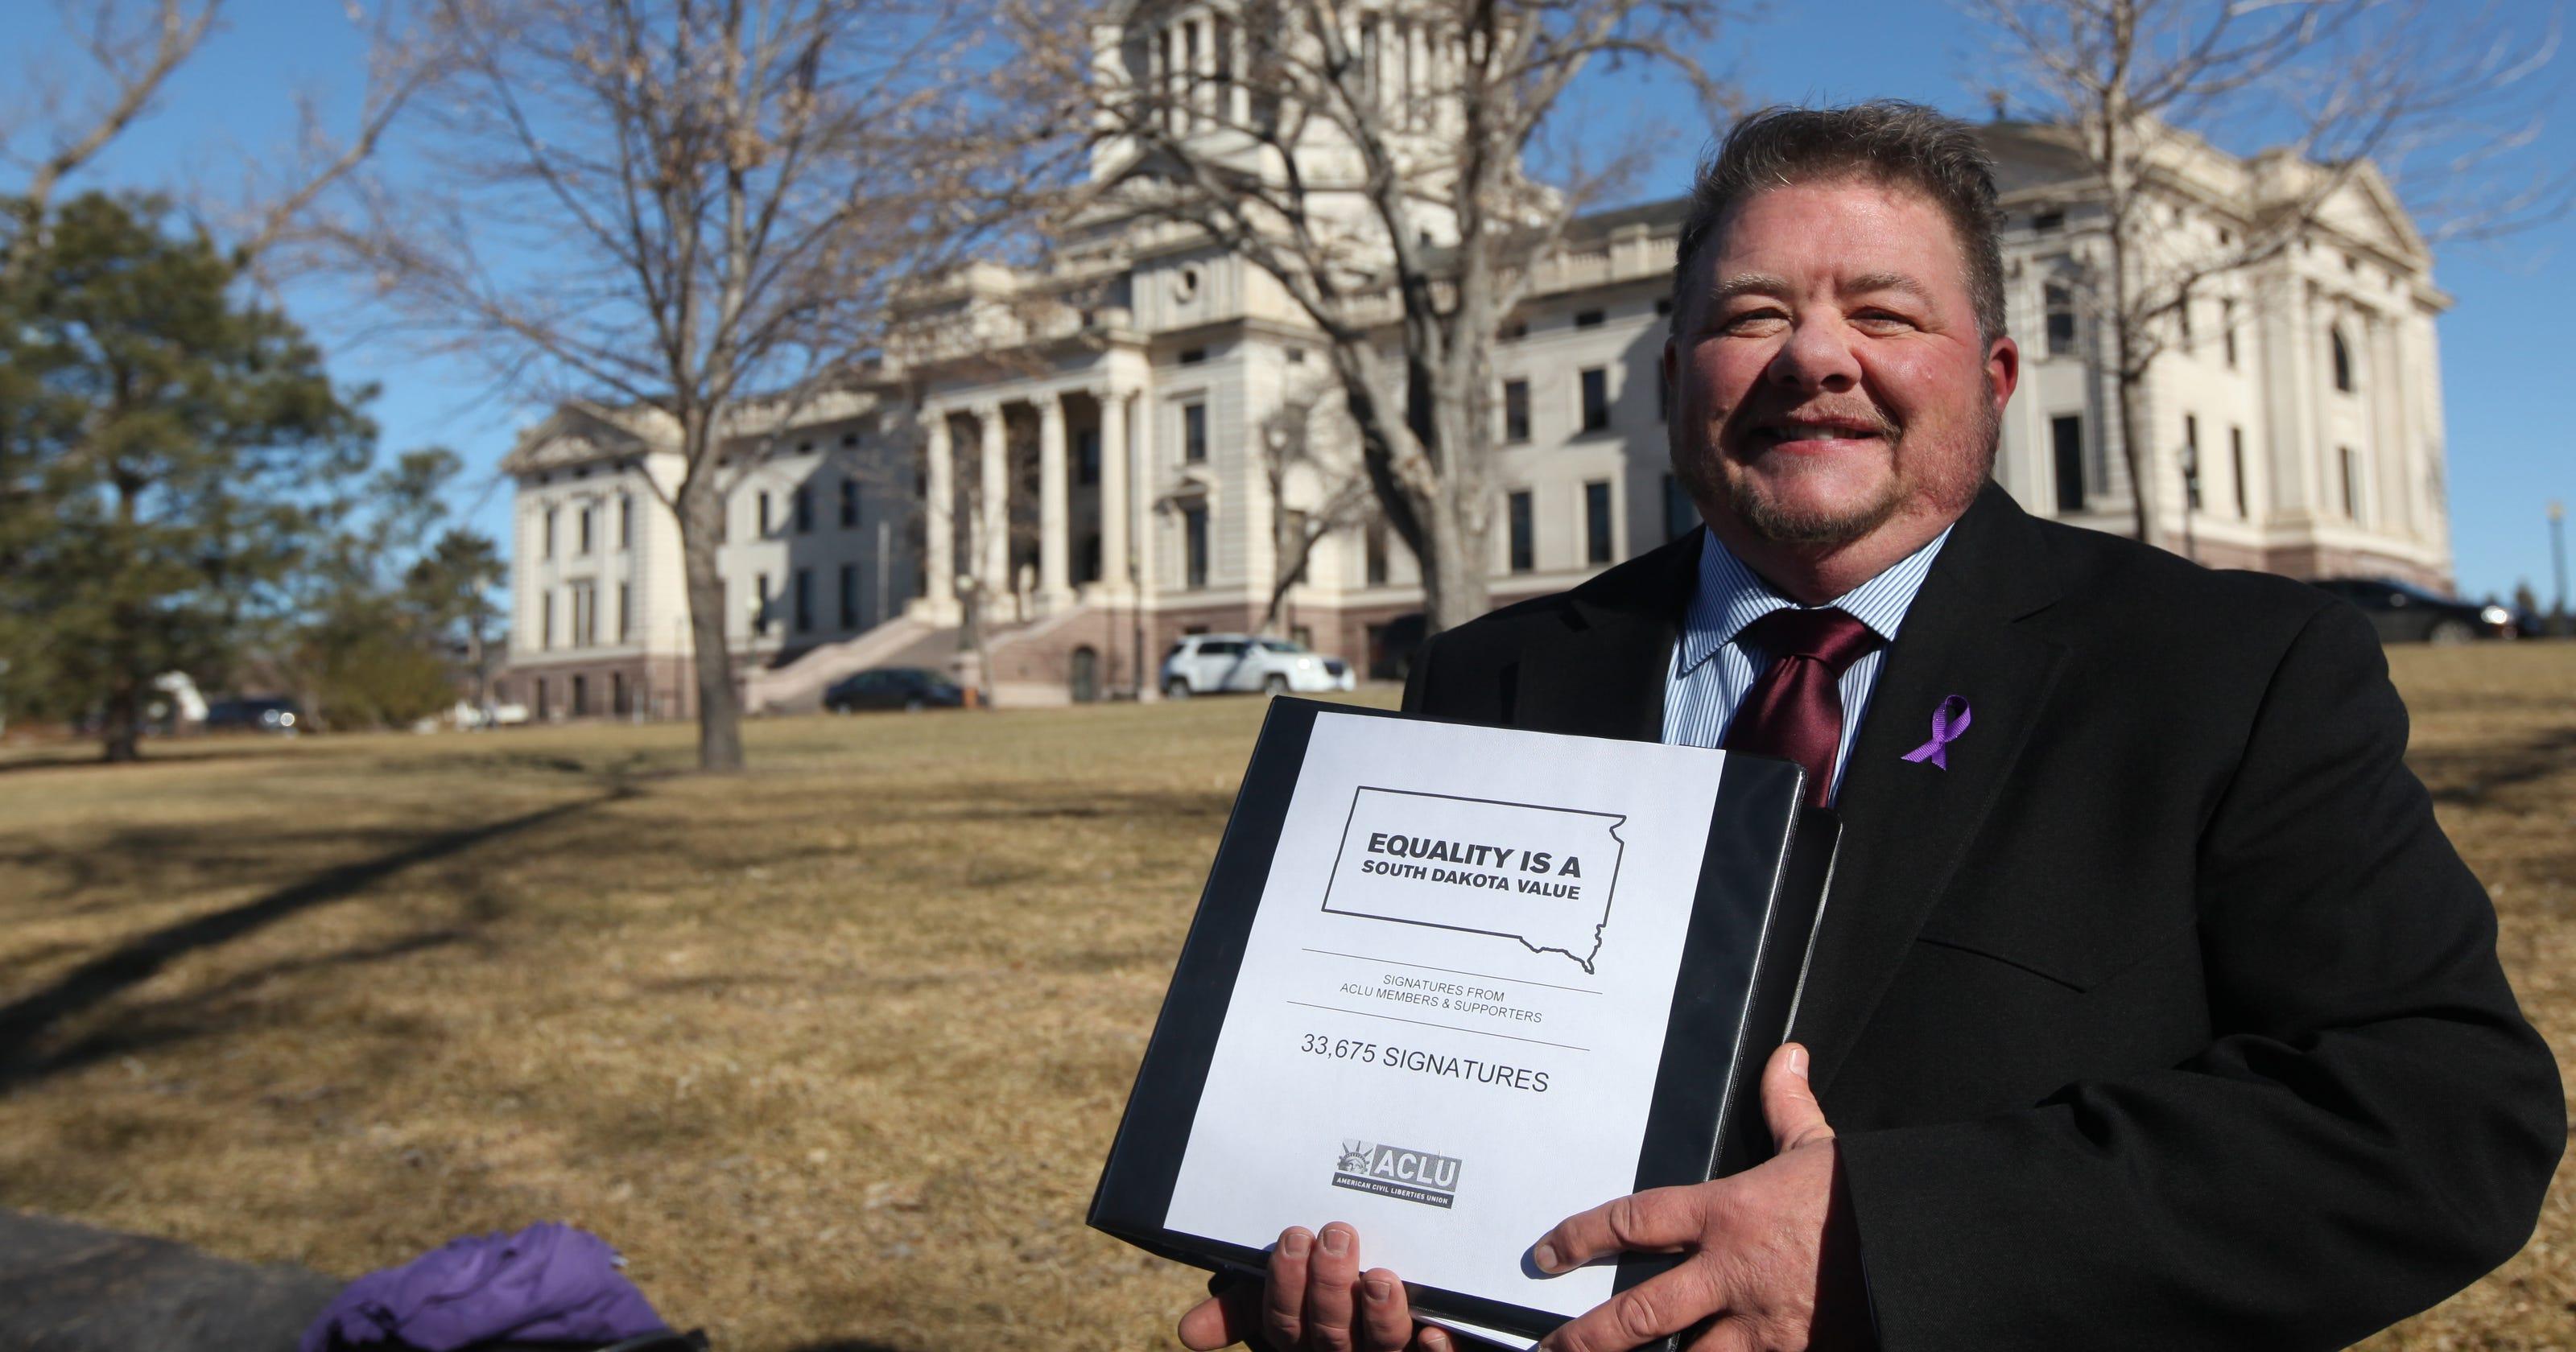 South Dakota Sued Over Transgender Health Policy